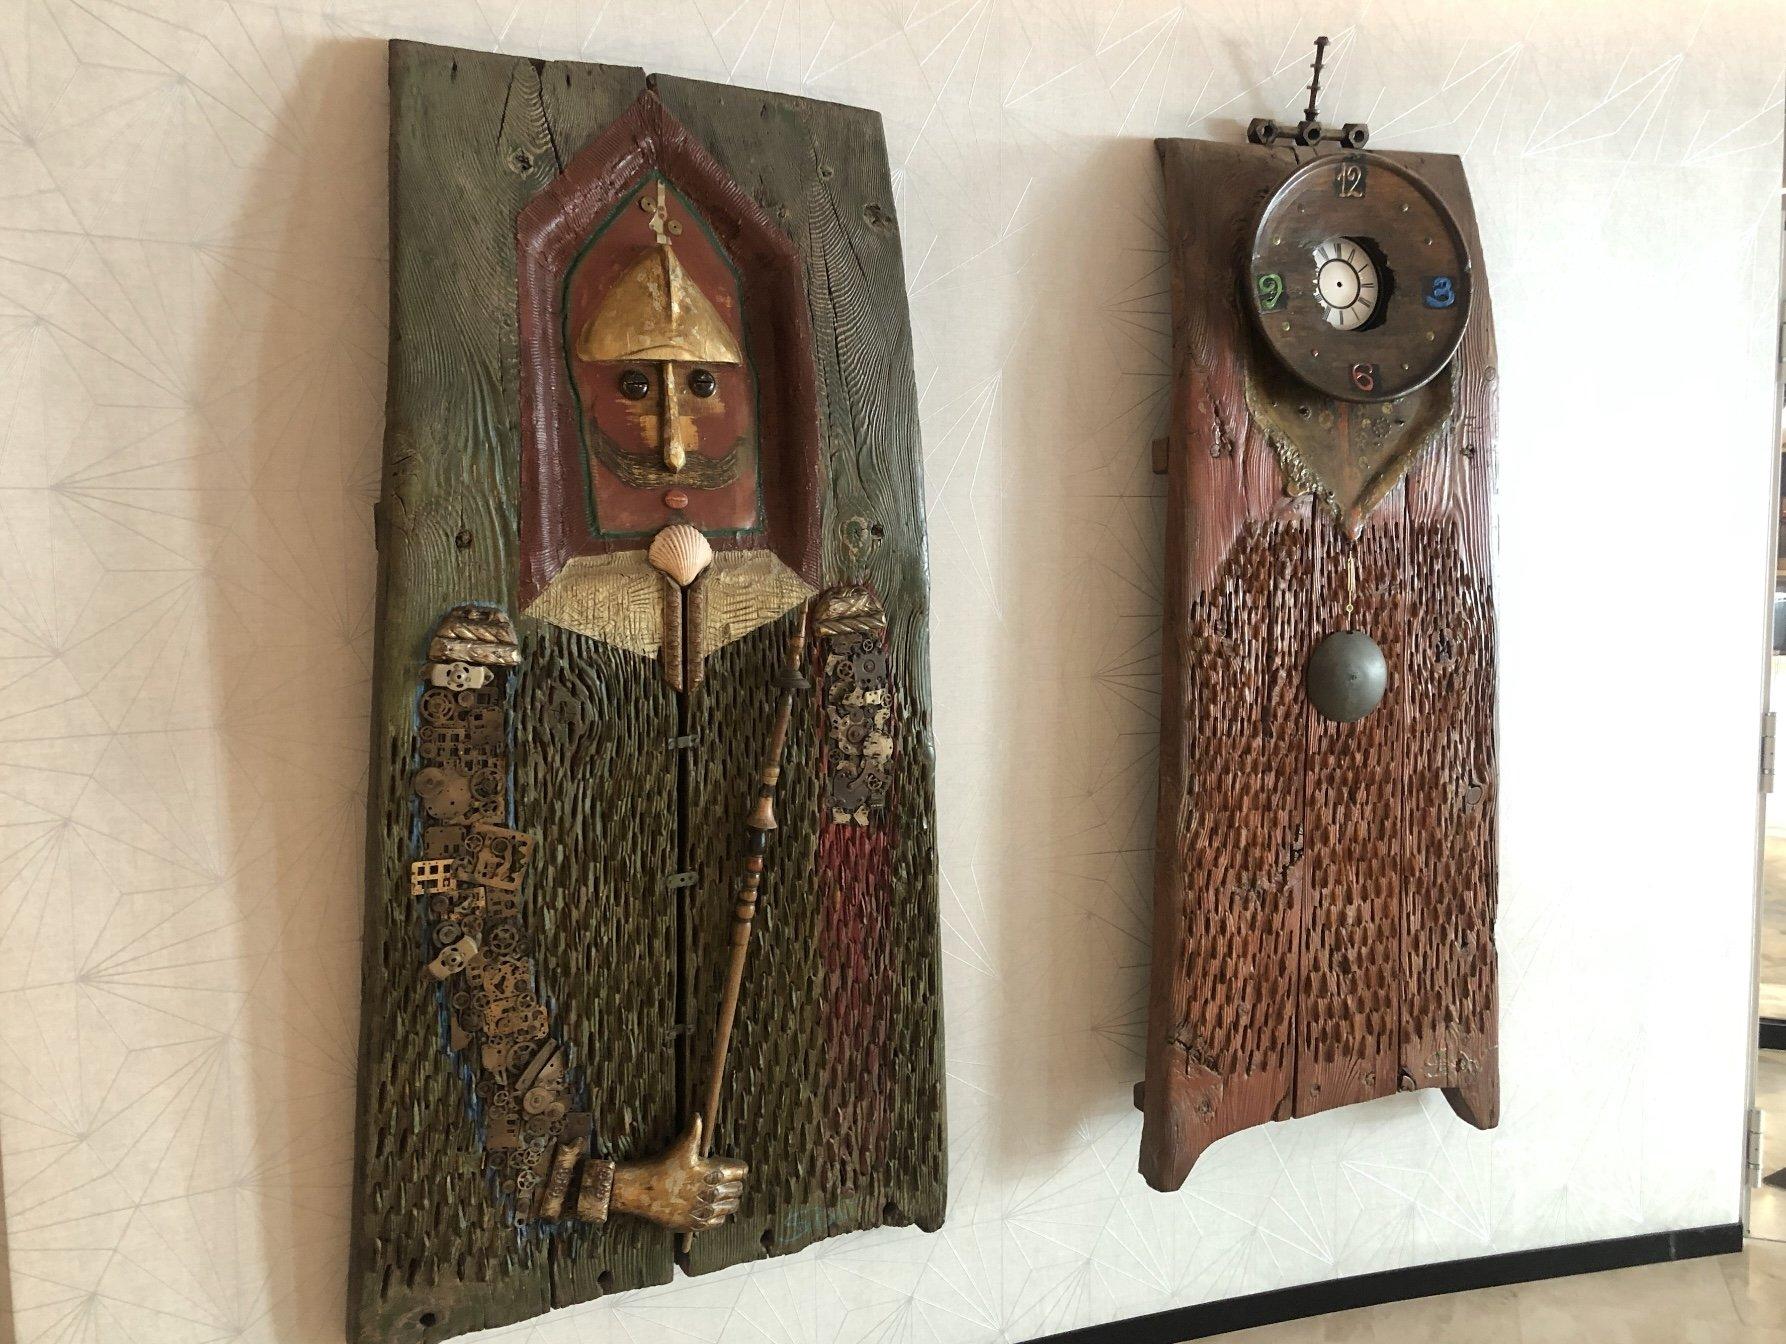 Wooden artwork at Hyatt Regency Sofia, Bulgaria.